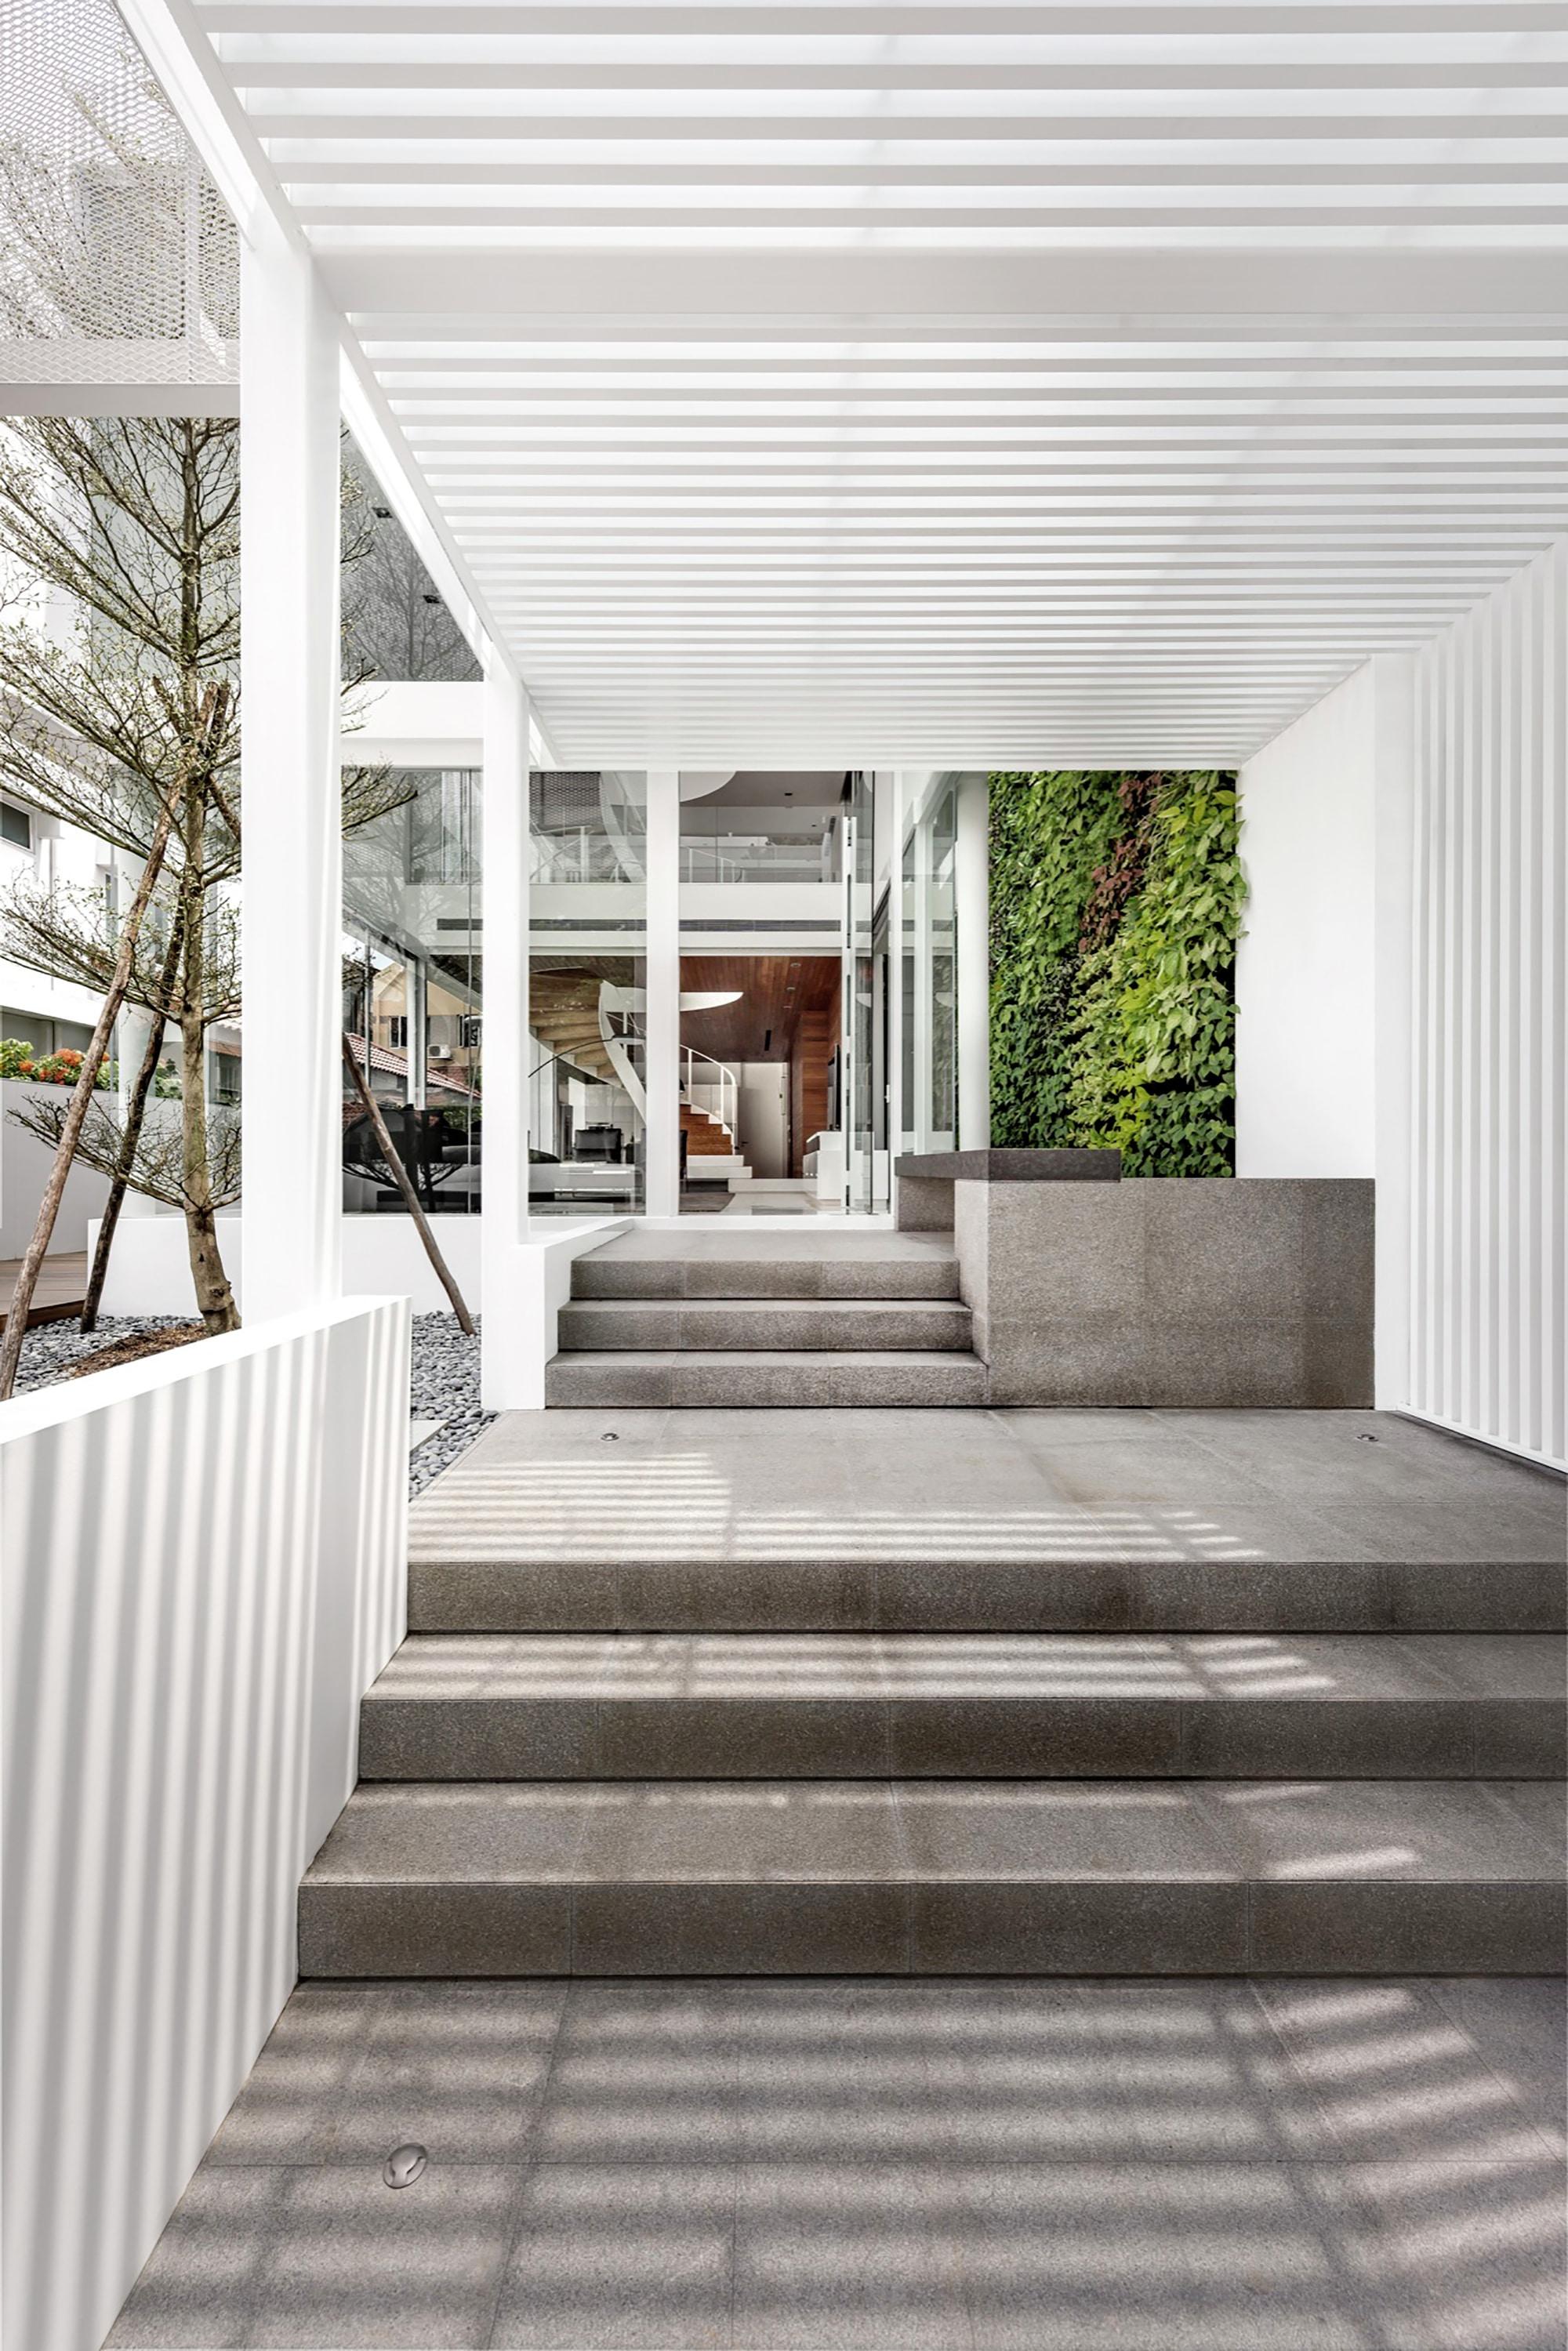 Casa moderna cuatro dormitorios for Diseno de gradas